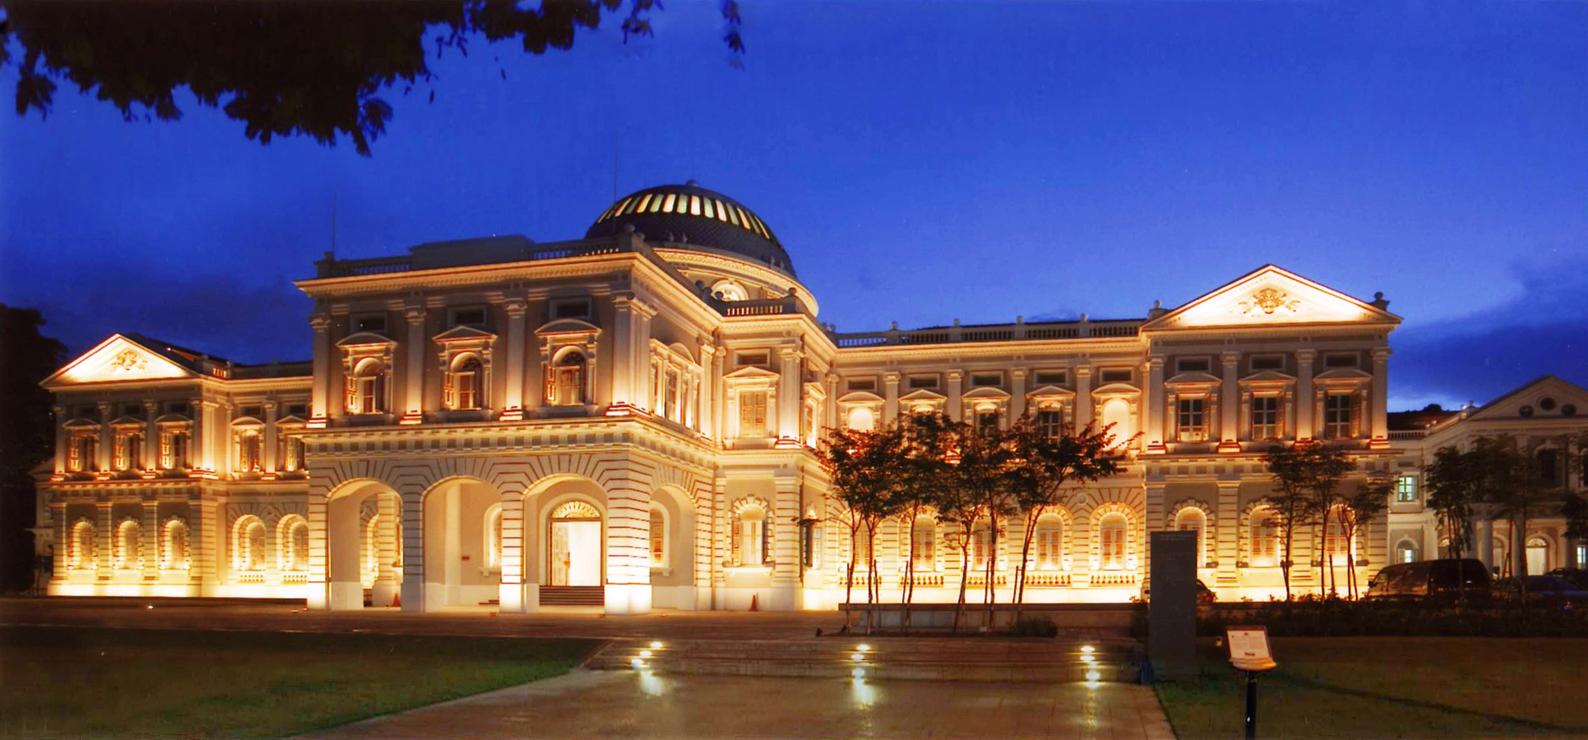 Artblog | Small World on National Museum Of Singapore  id=99366